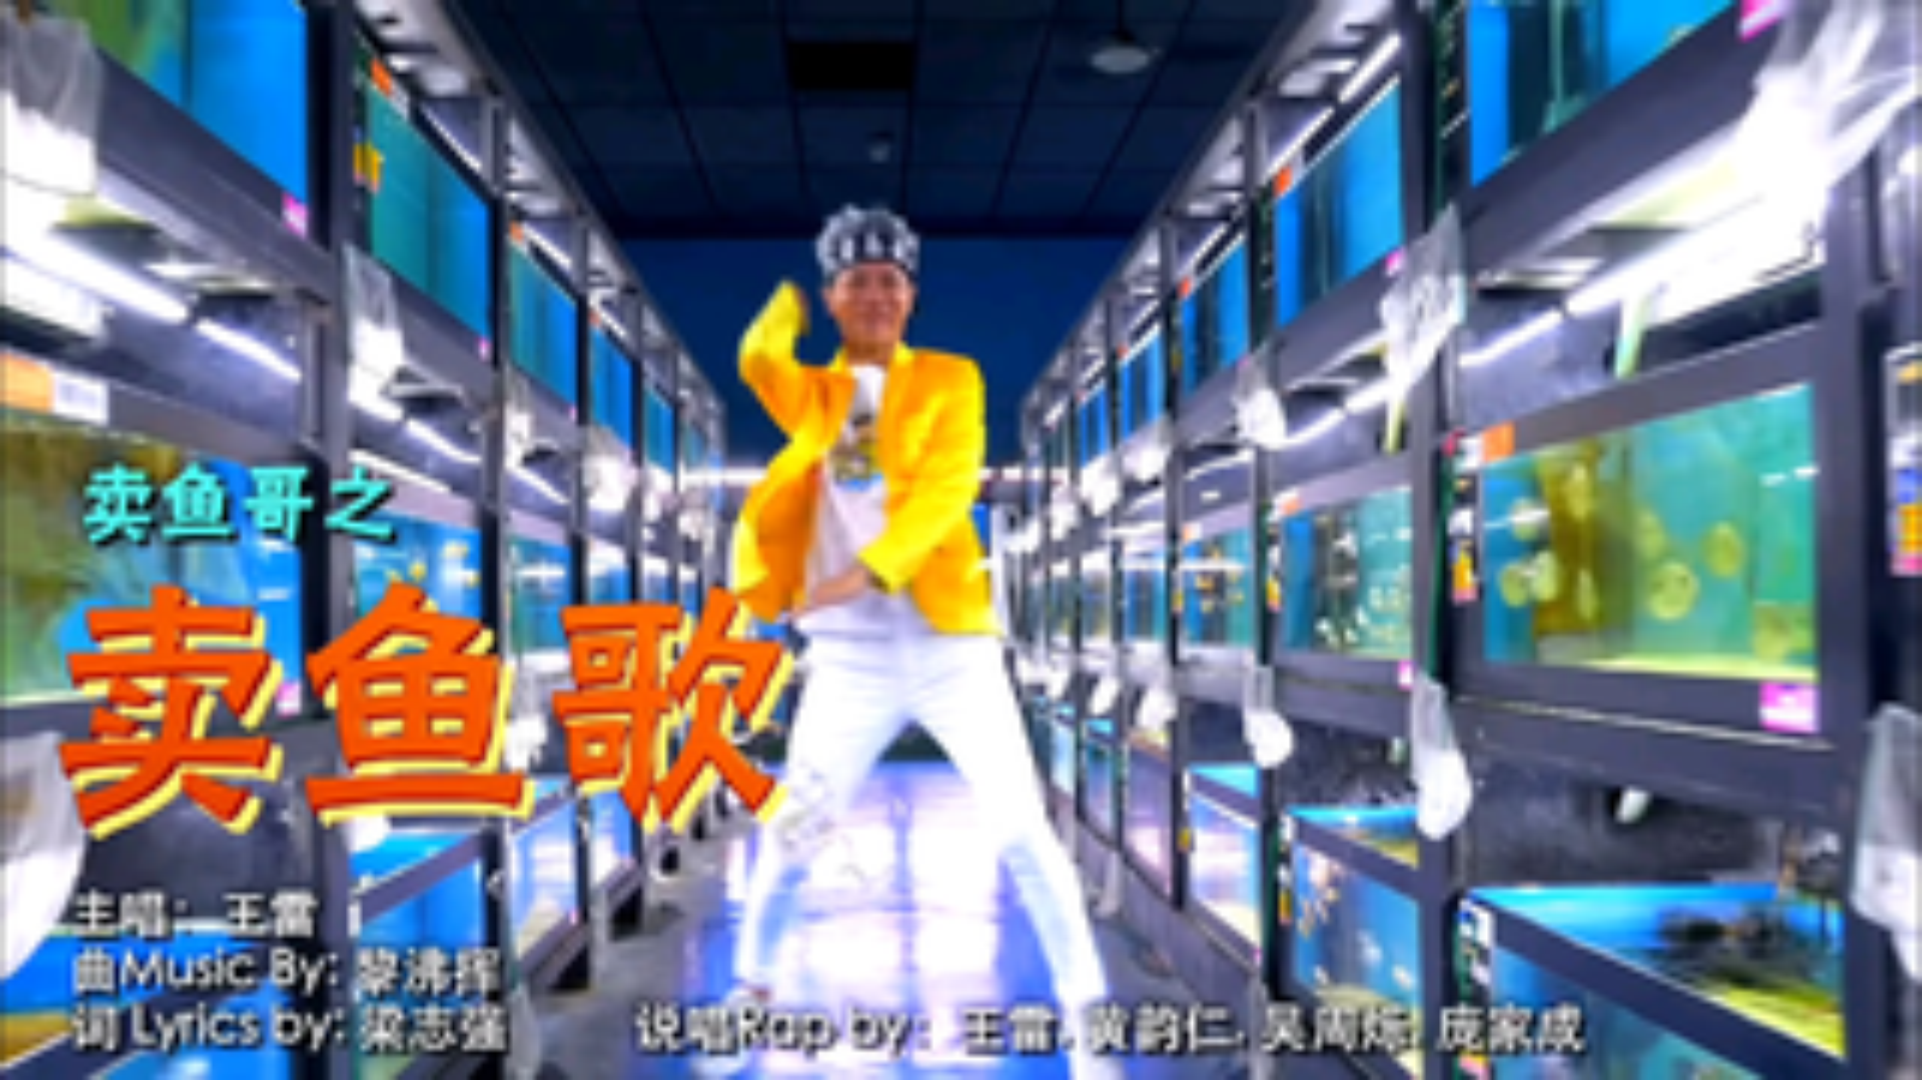 王雷卖鱼哥之《卖鱼歌》Wang Lei Official Music Video